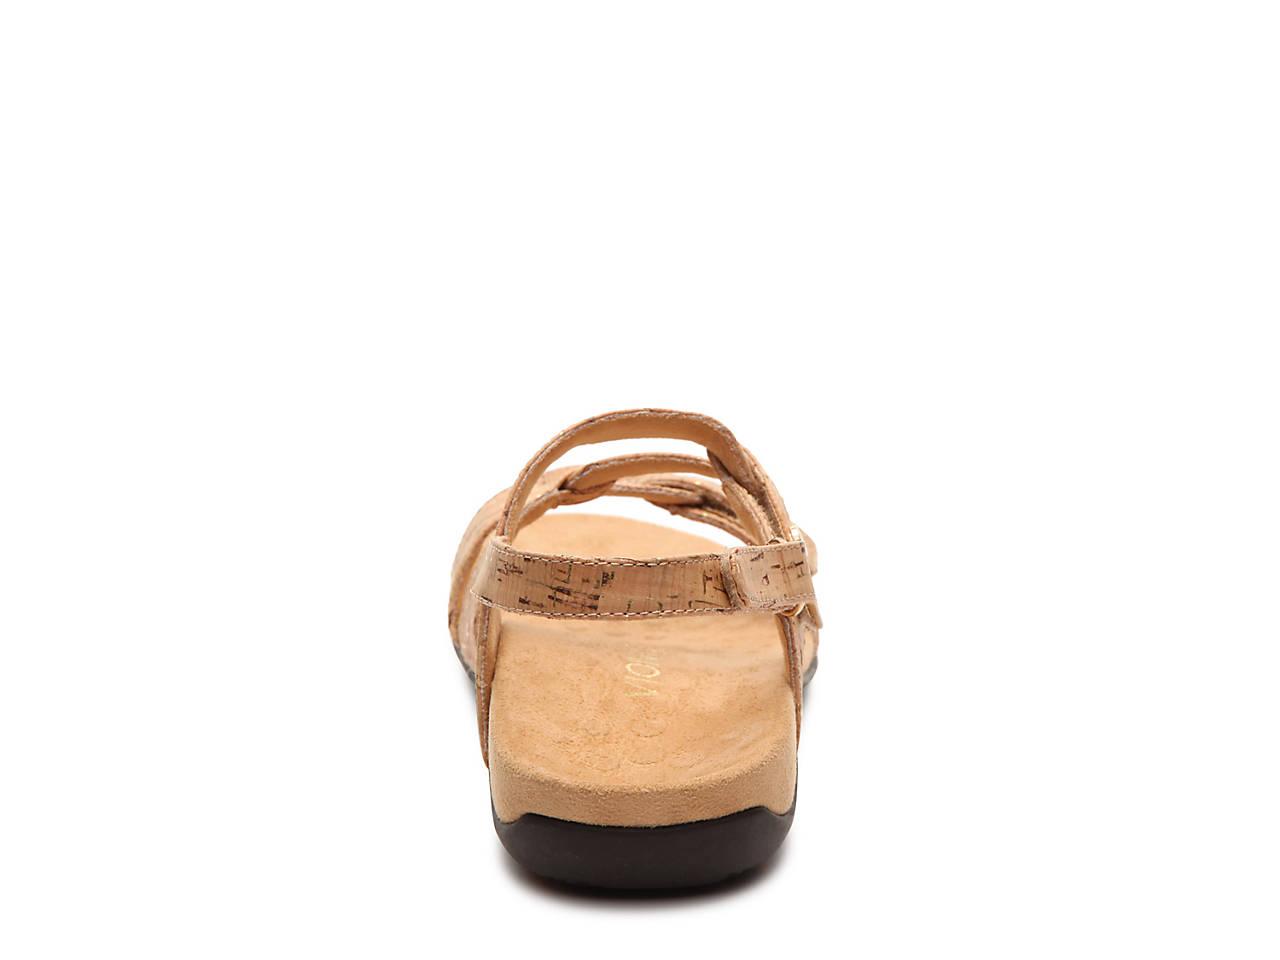 b21fcb7f78b9 Vionic Paros Flat Sandal Women s Shoes